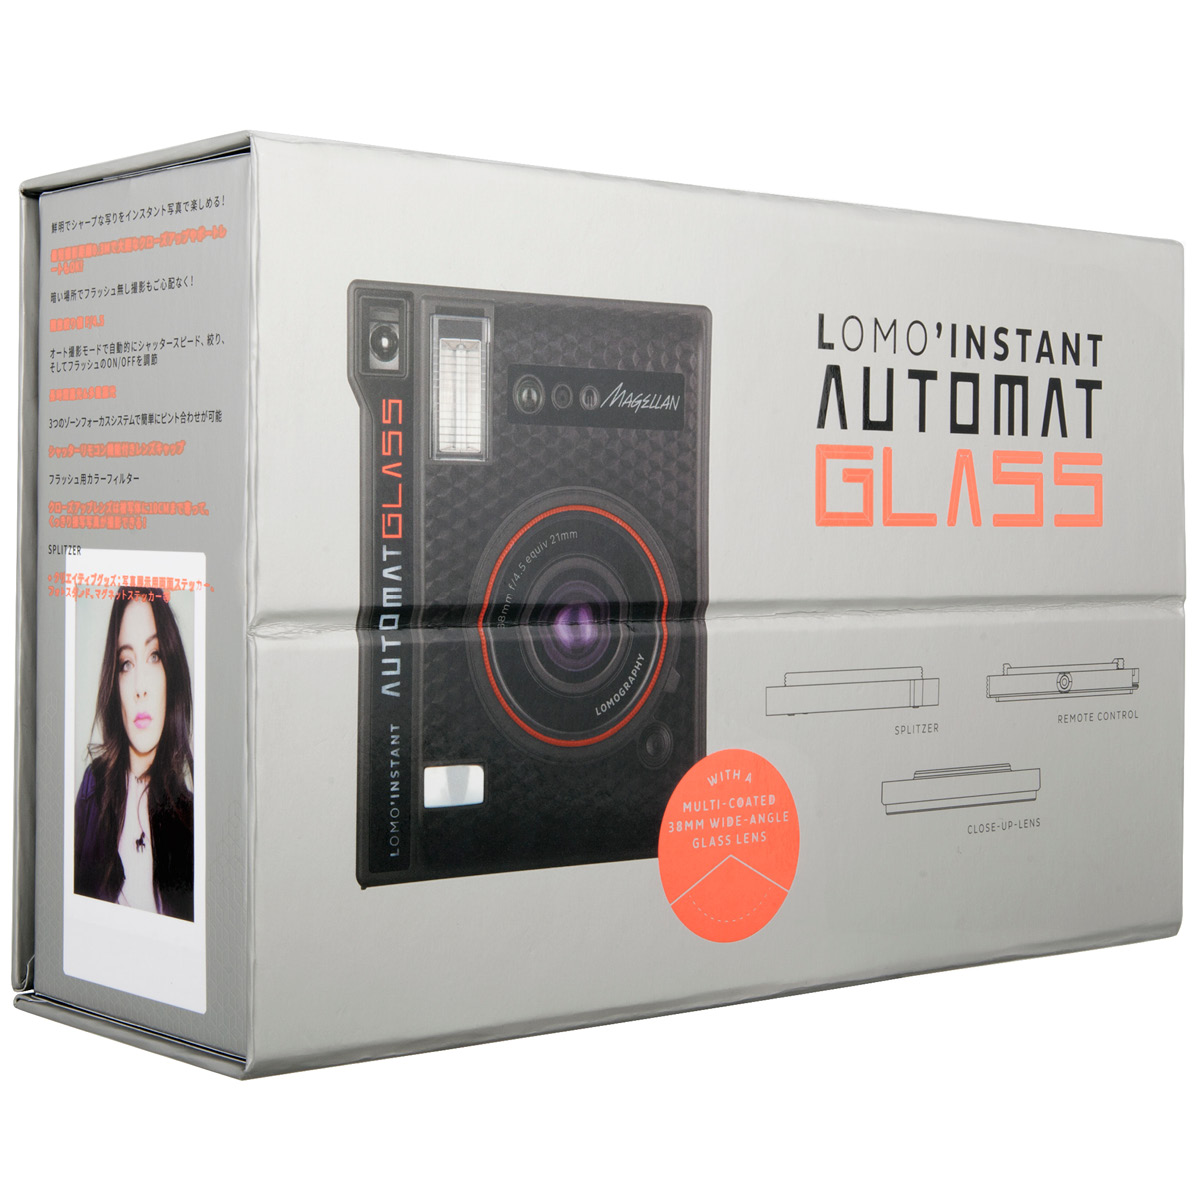 Lomography Lomo'Instant Automat Glass Magellan